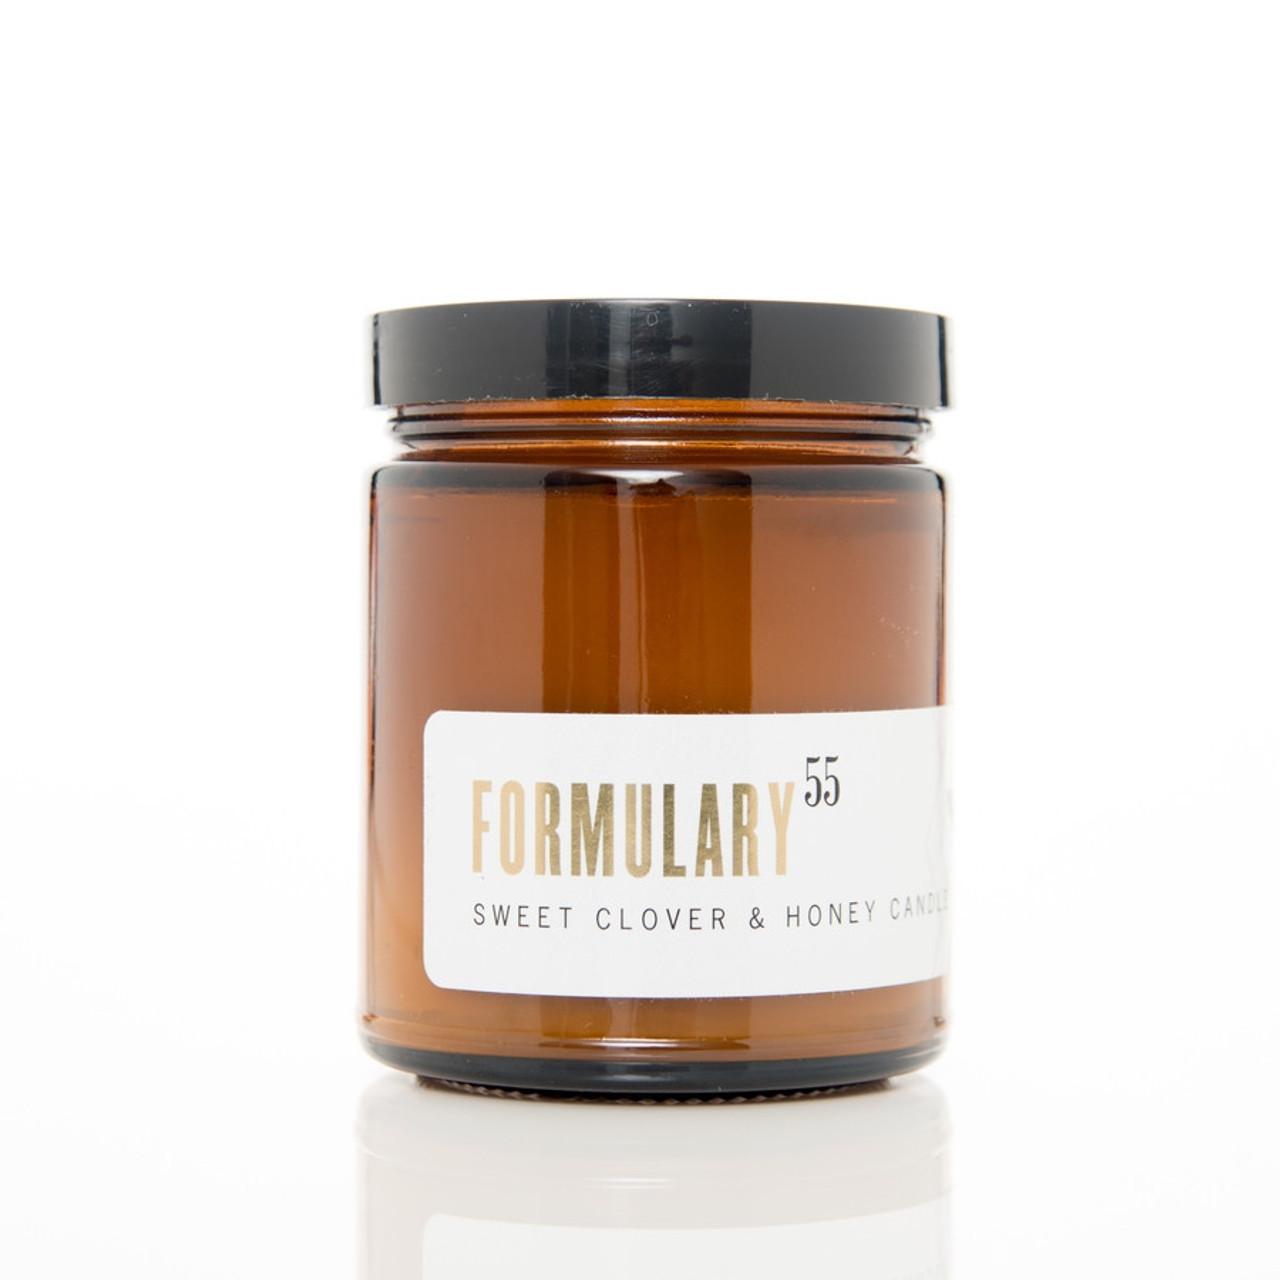 Botanical Apothecary Candle - Sweet Clover & Honey